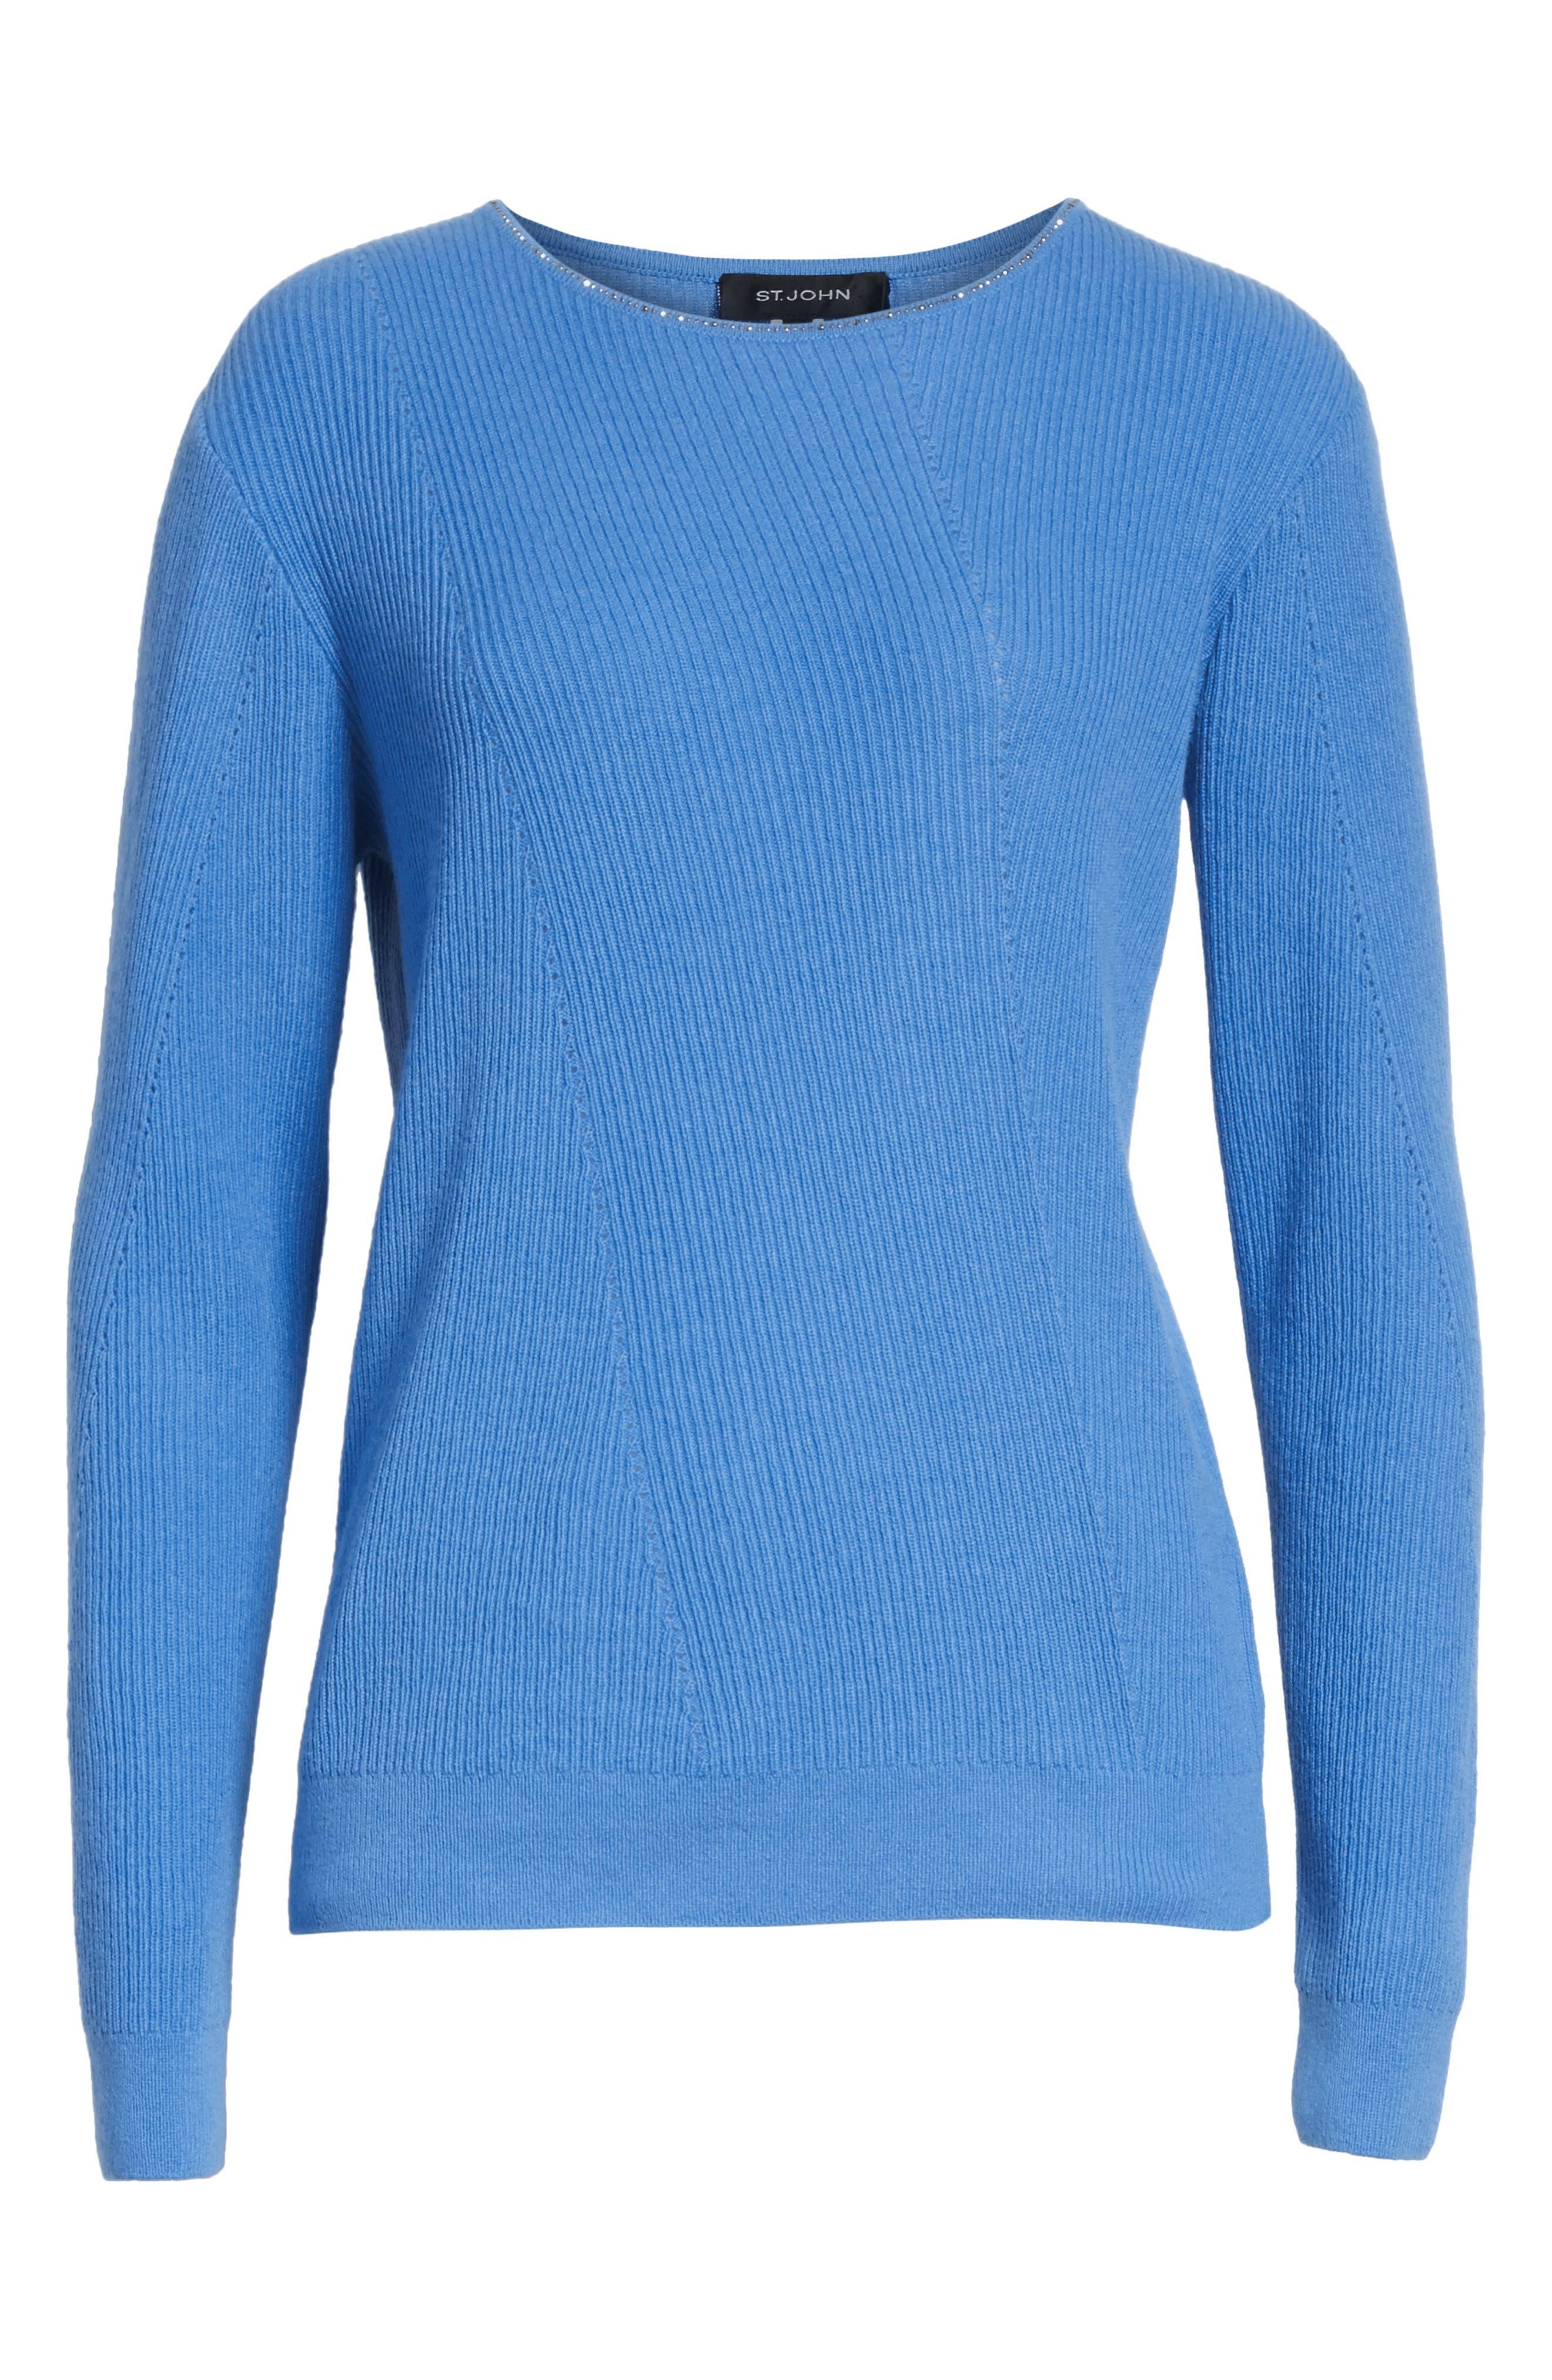 Cashmere Sweater,                             Alternate thumbnail 6, color,                             420